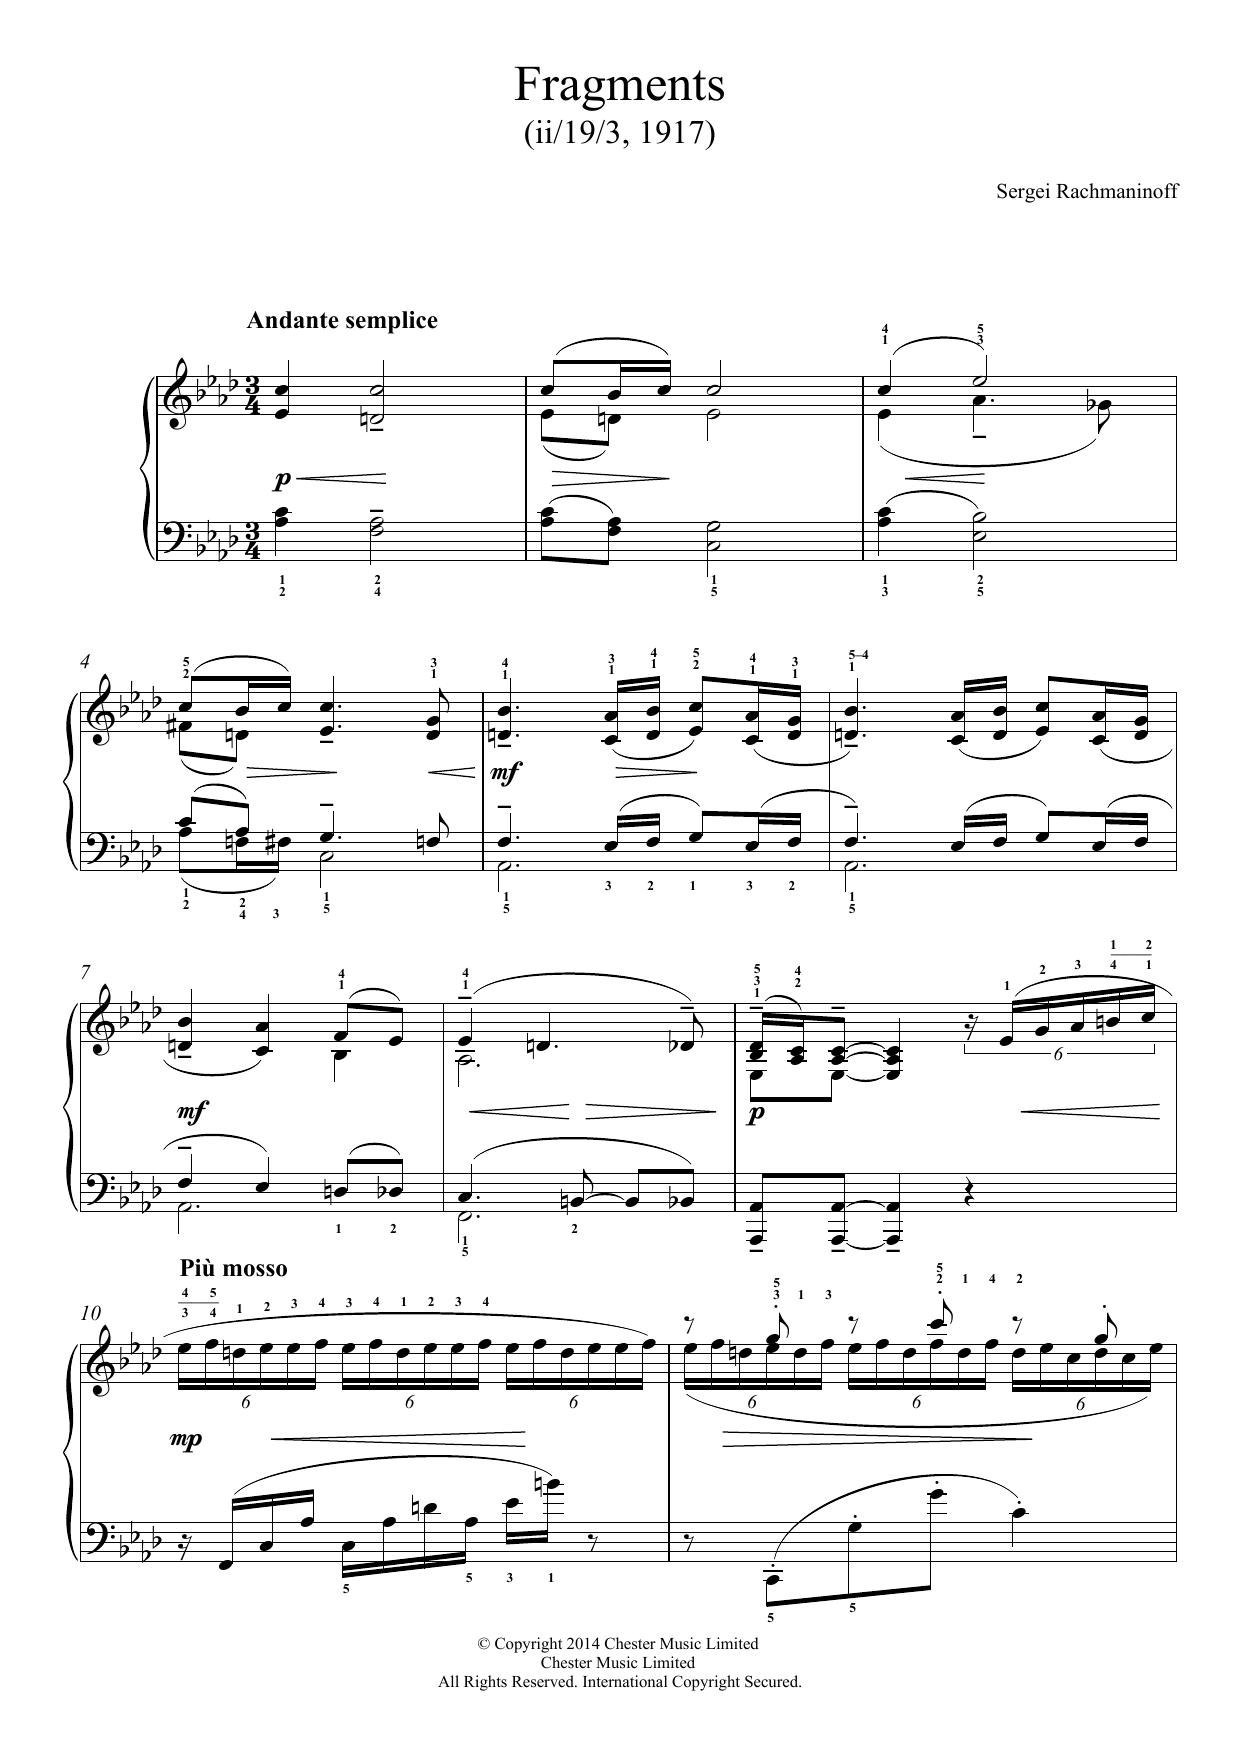 Sergei Rachmaninoff - Fragments (1917)